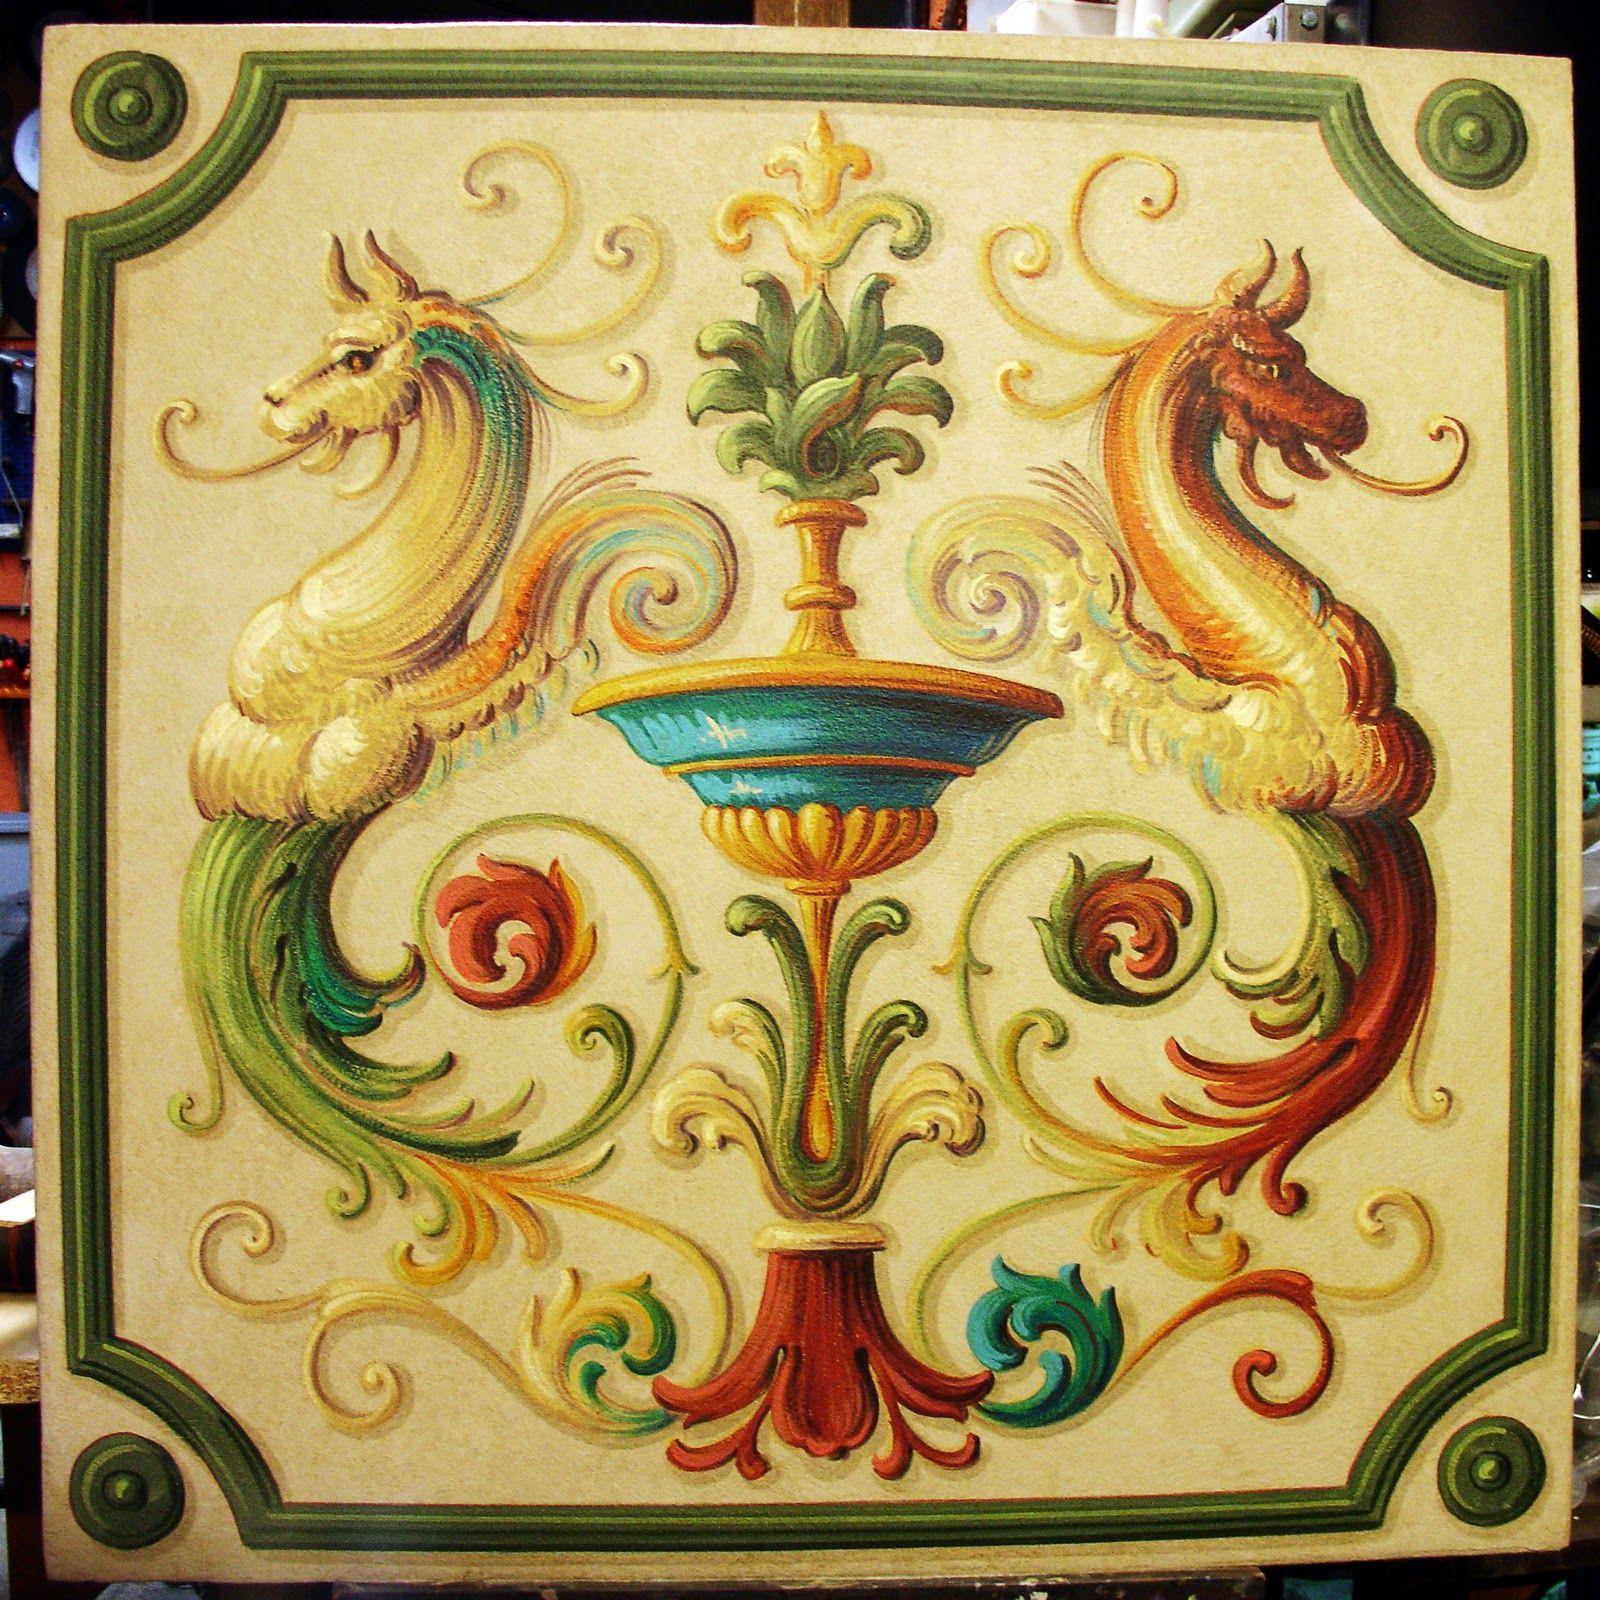 Grottesca grotesque pinterest decorative paintings - Decorazioni grottesche ...